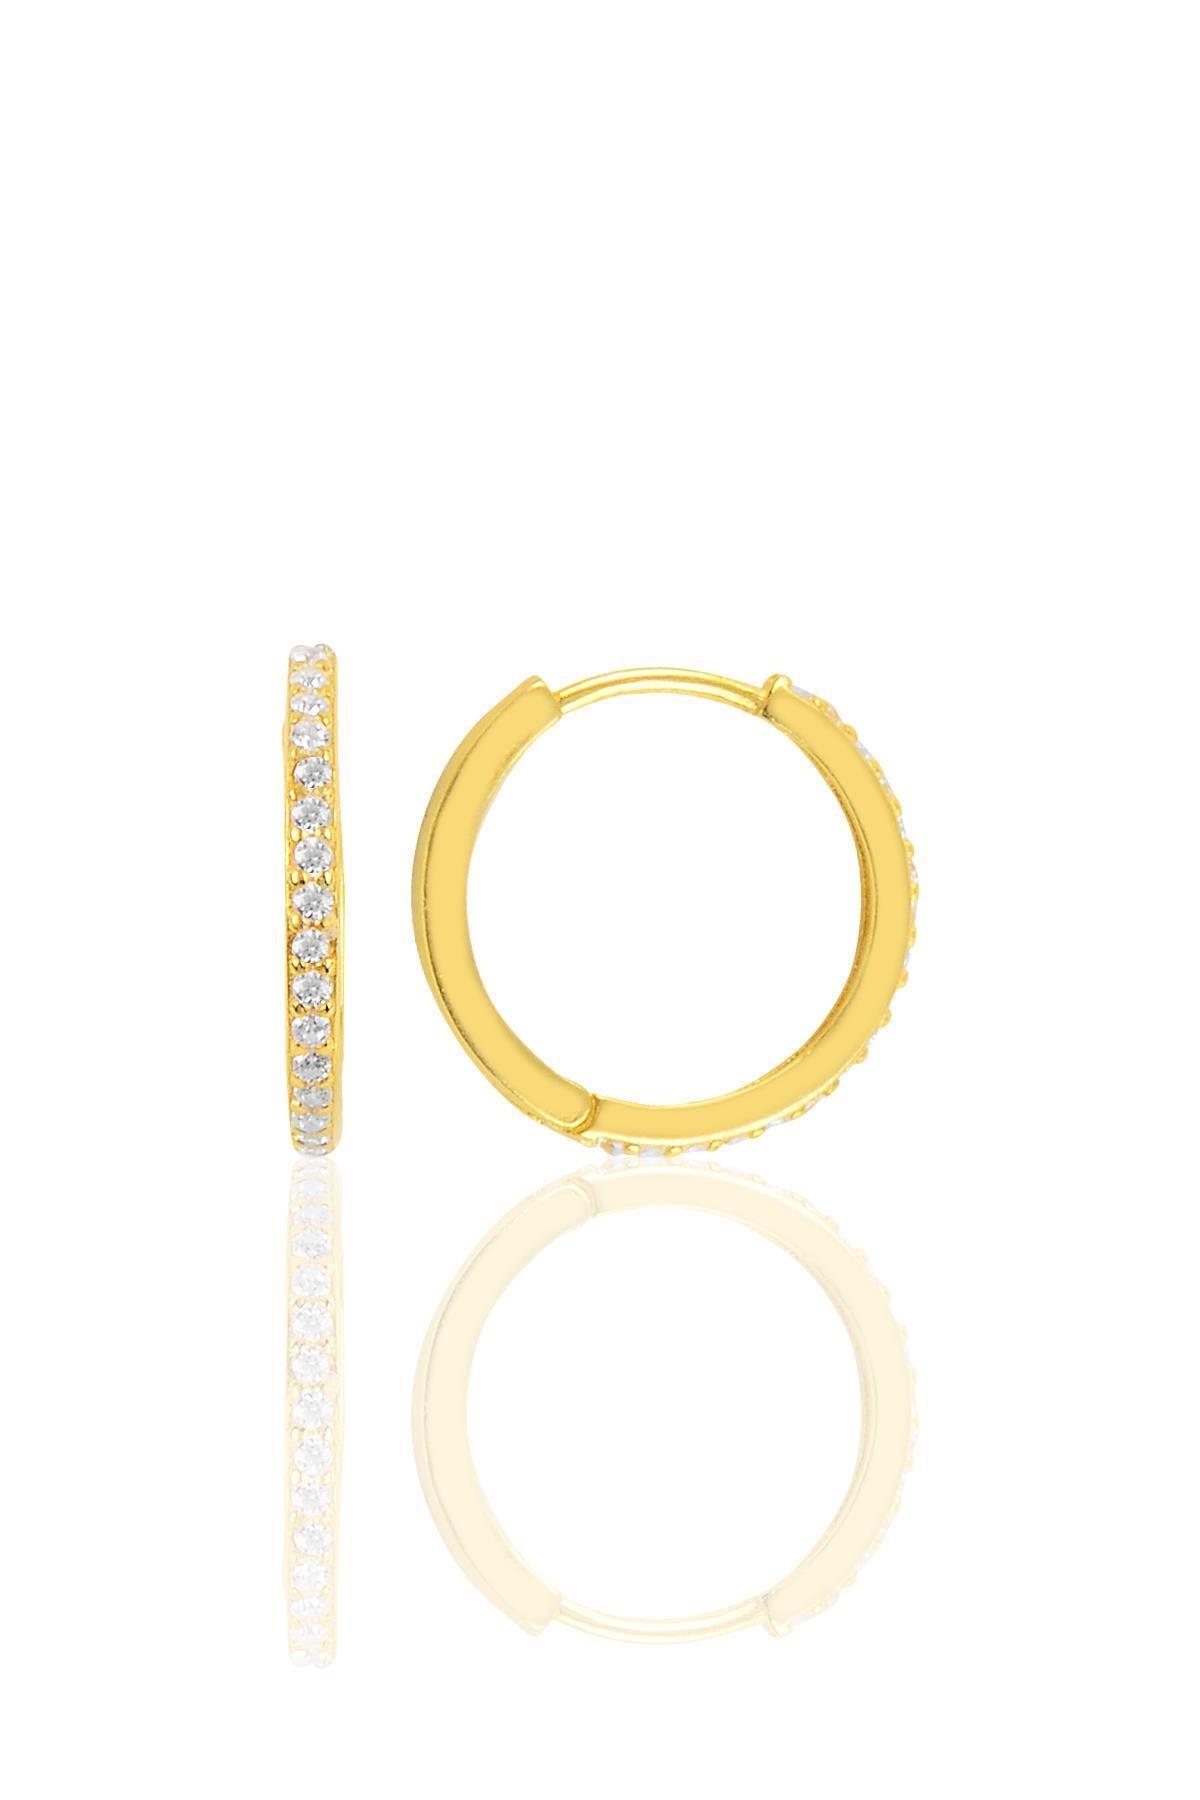 Söğütlü Silver Gümüş Altın Yaldızlı 17 Mm Halka Küpe 0